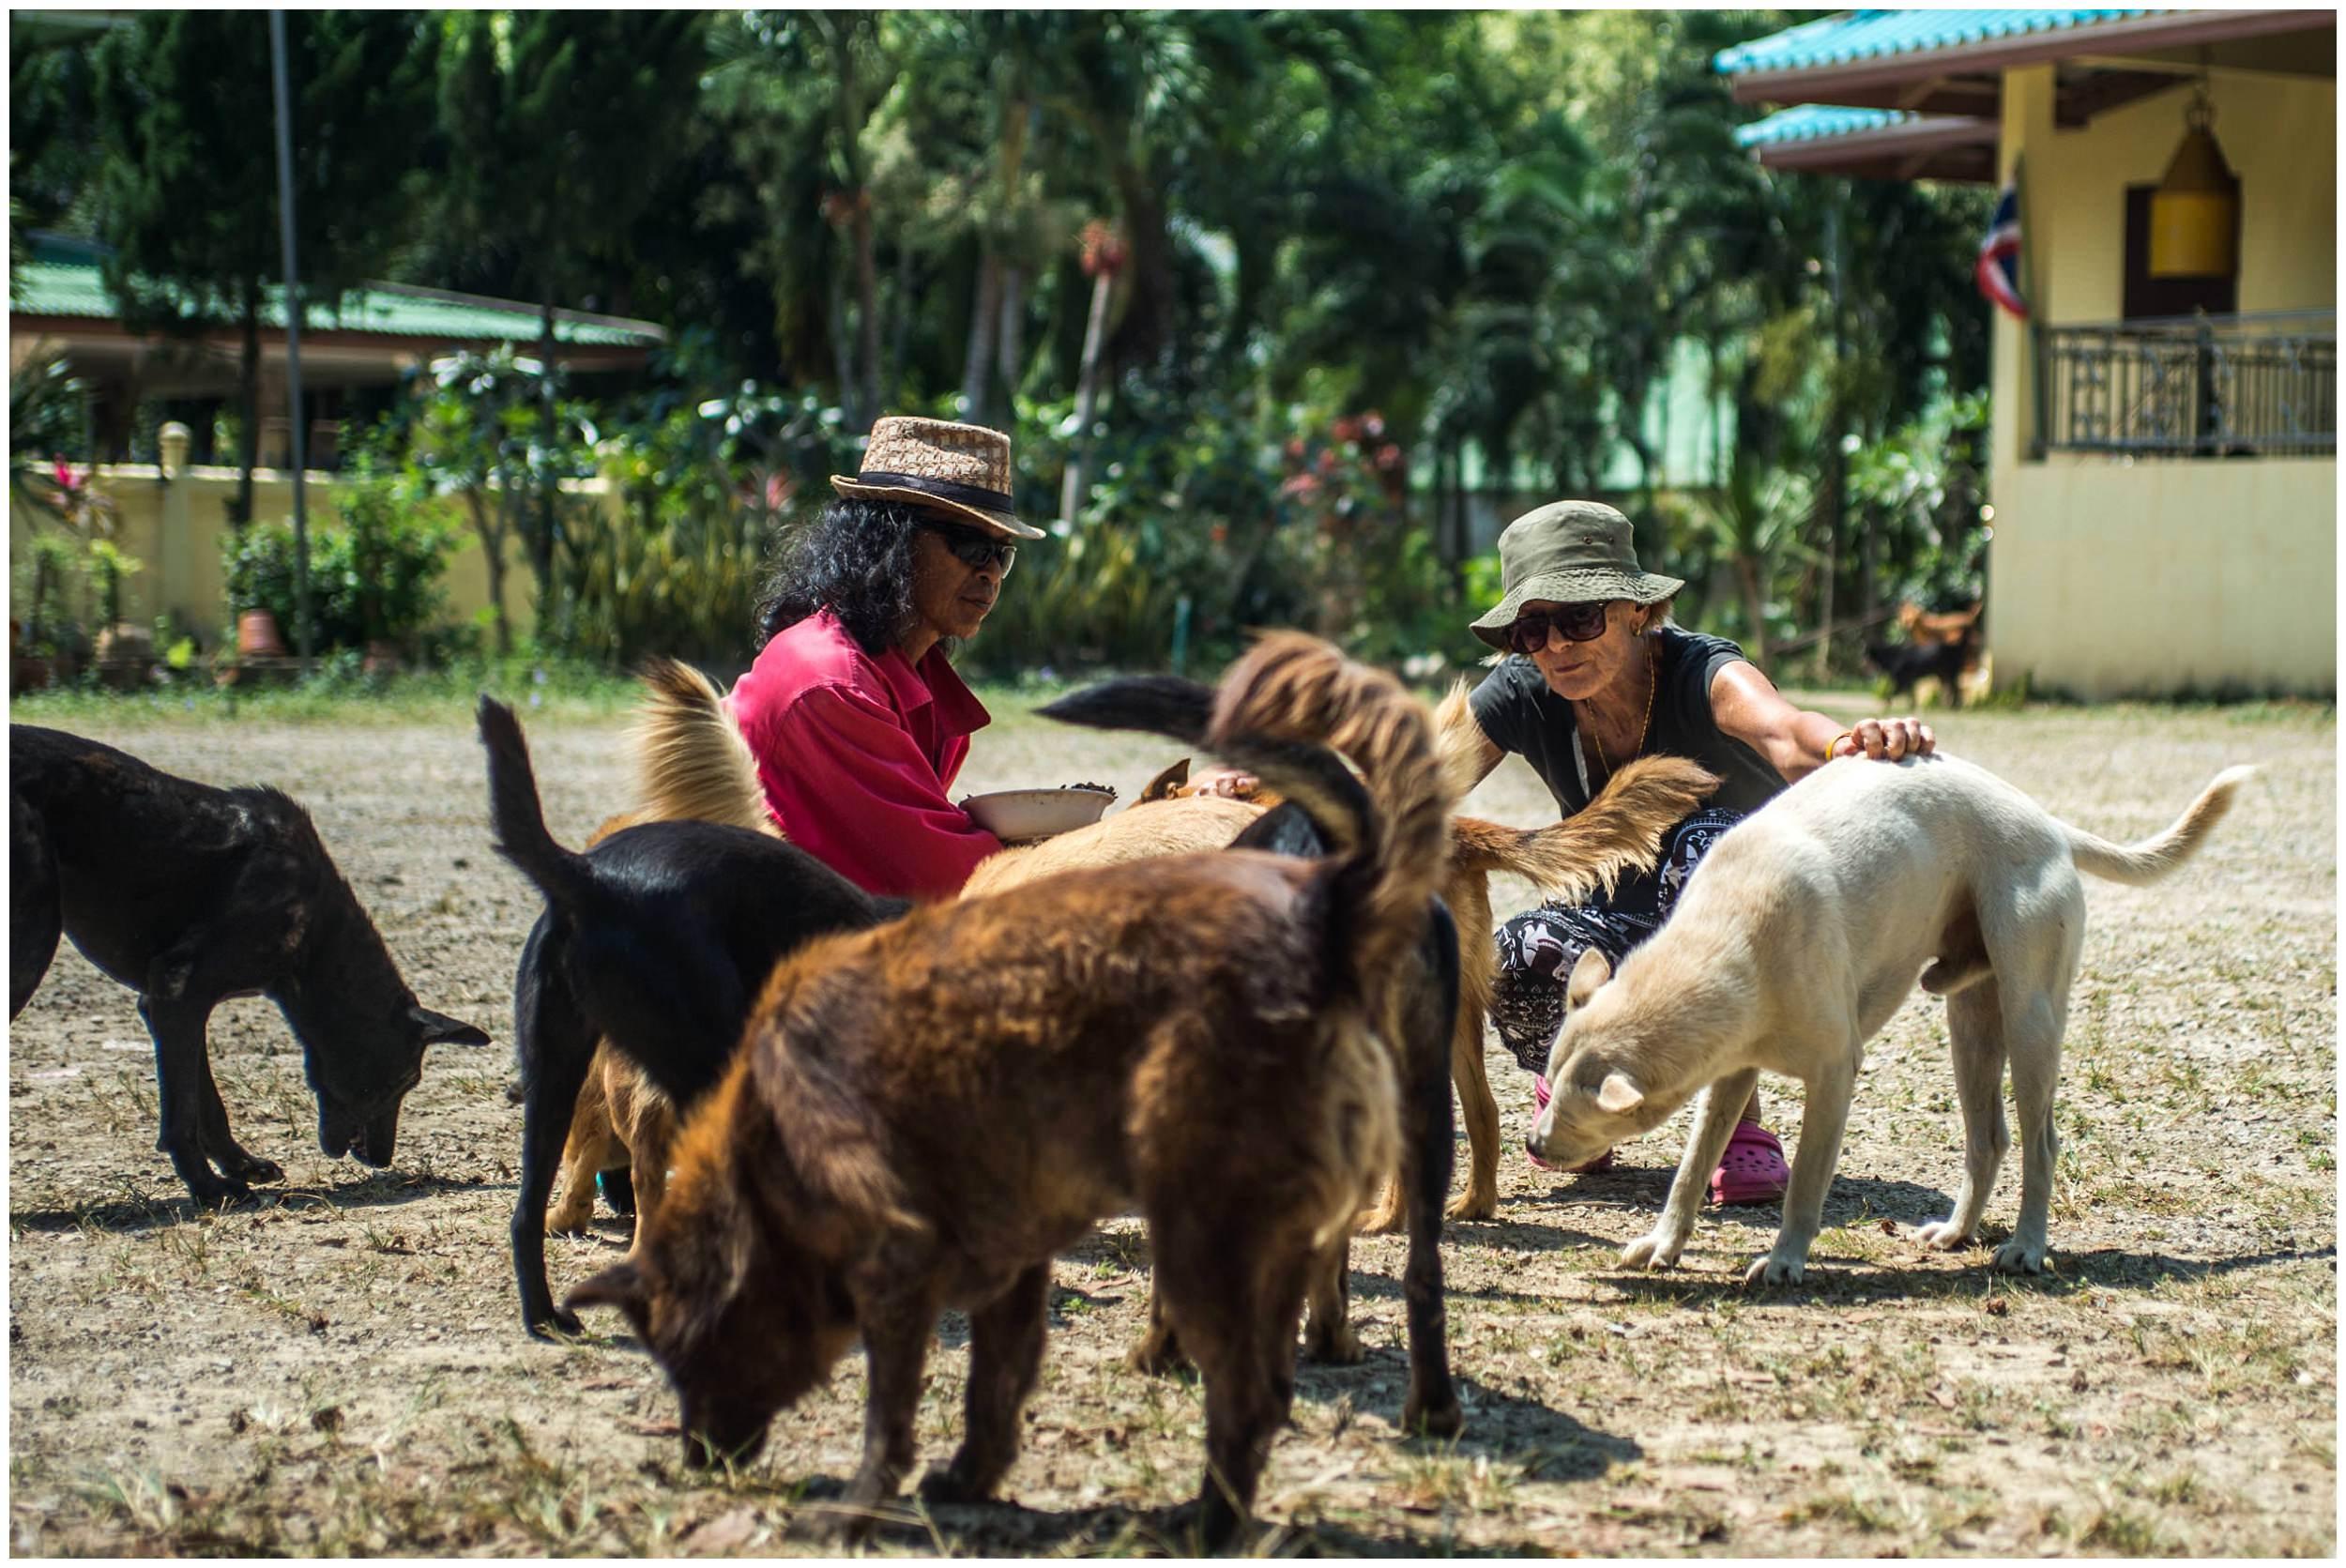 Headrock, dogs, shelter, rescue, people, hands, compassion, care, bang saphan, thailand, honden, straathonden, opvangcentrum, rehabilitatie, rehabilitation, asiel, verzorging, compassie, suthep sankuntod, hurricane tep, verity cattanach poole, temple